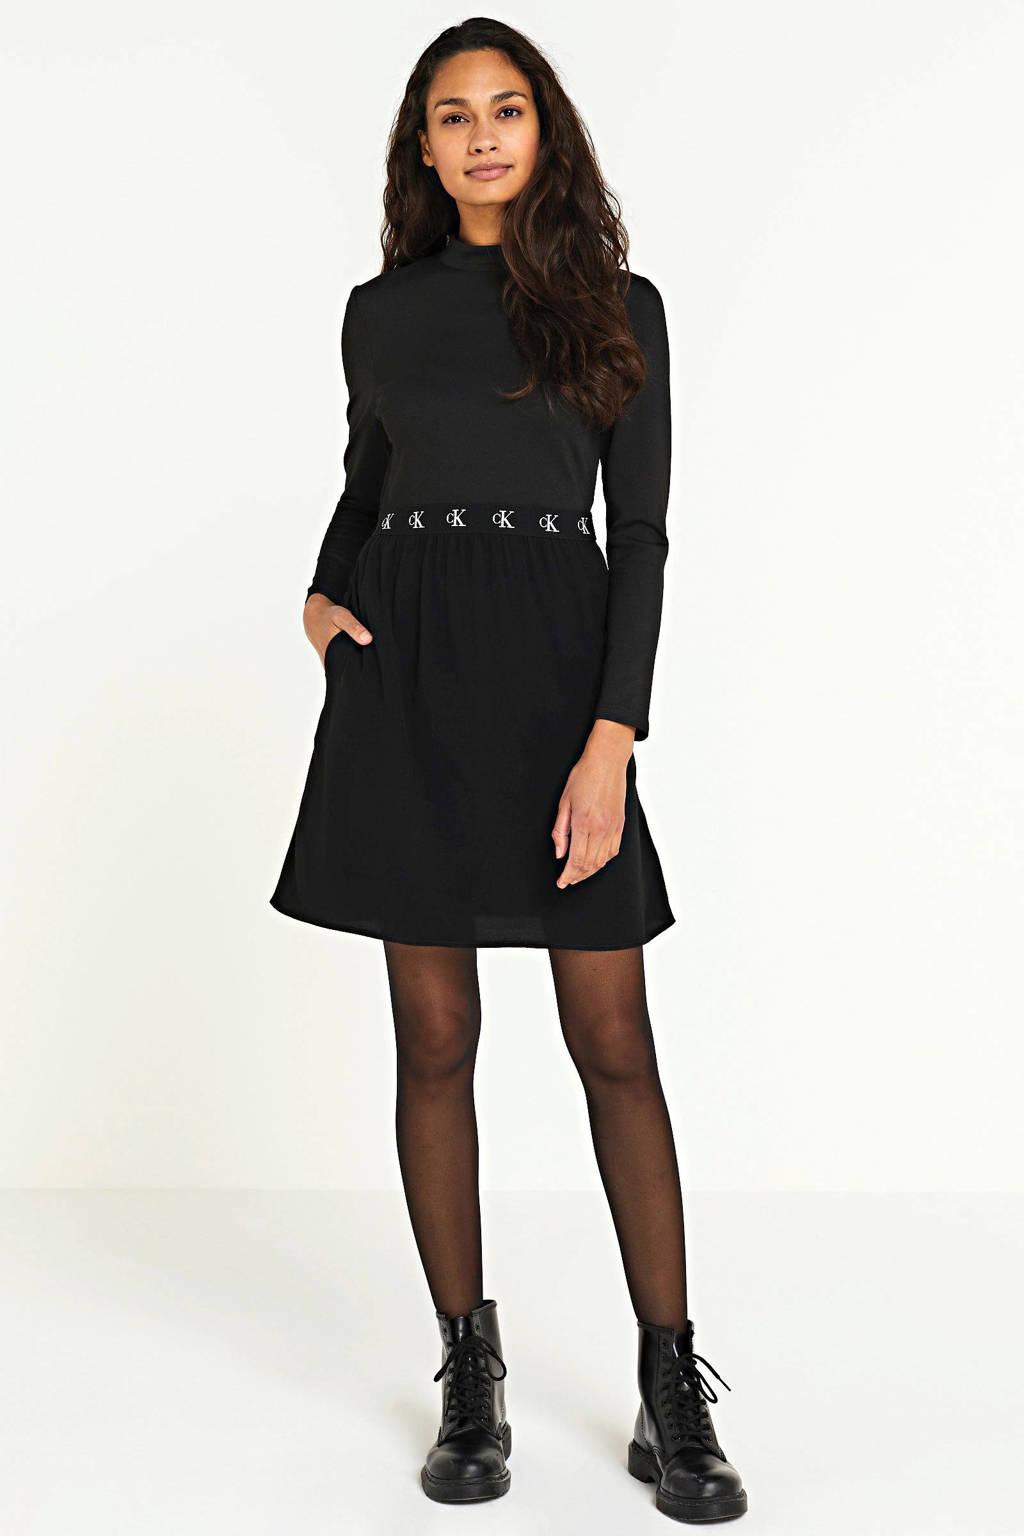 CALVIN KLEIN jurk met logo zwart, Zwart